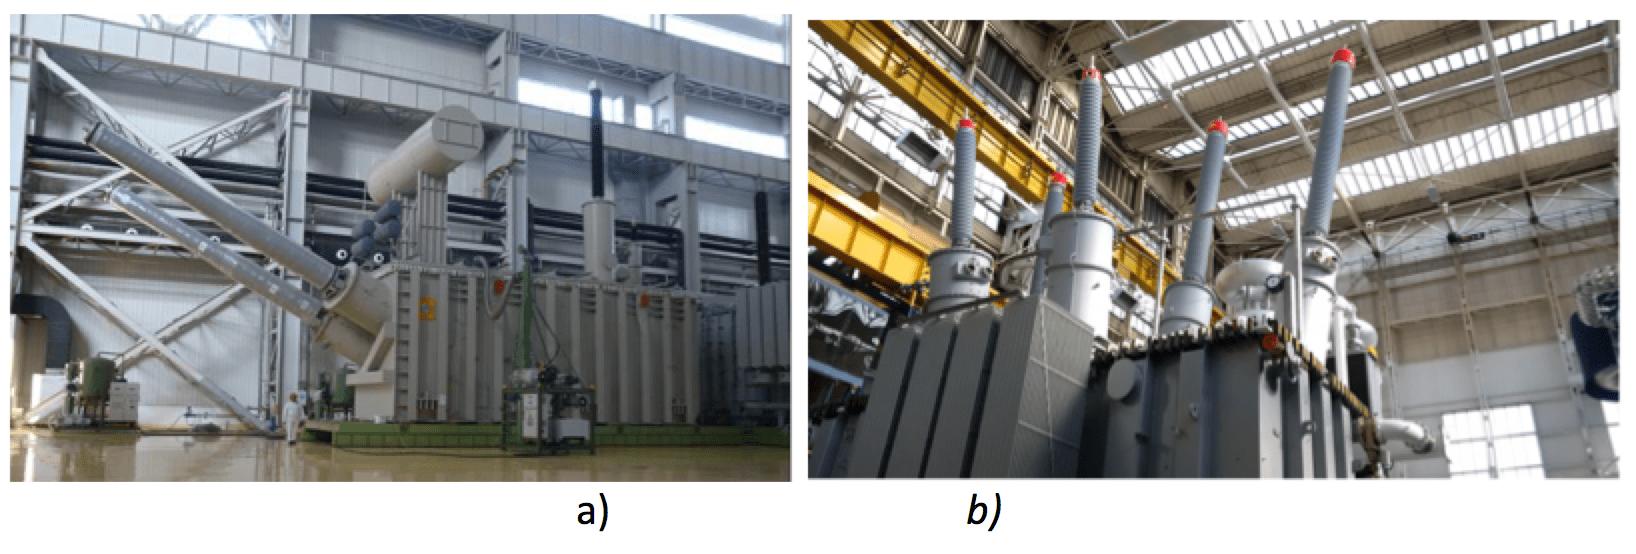 [object object] External Insulation Under Composite AC Plus DC Voltages Bushings for HVDC converter applications